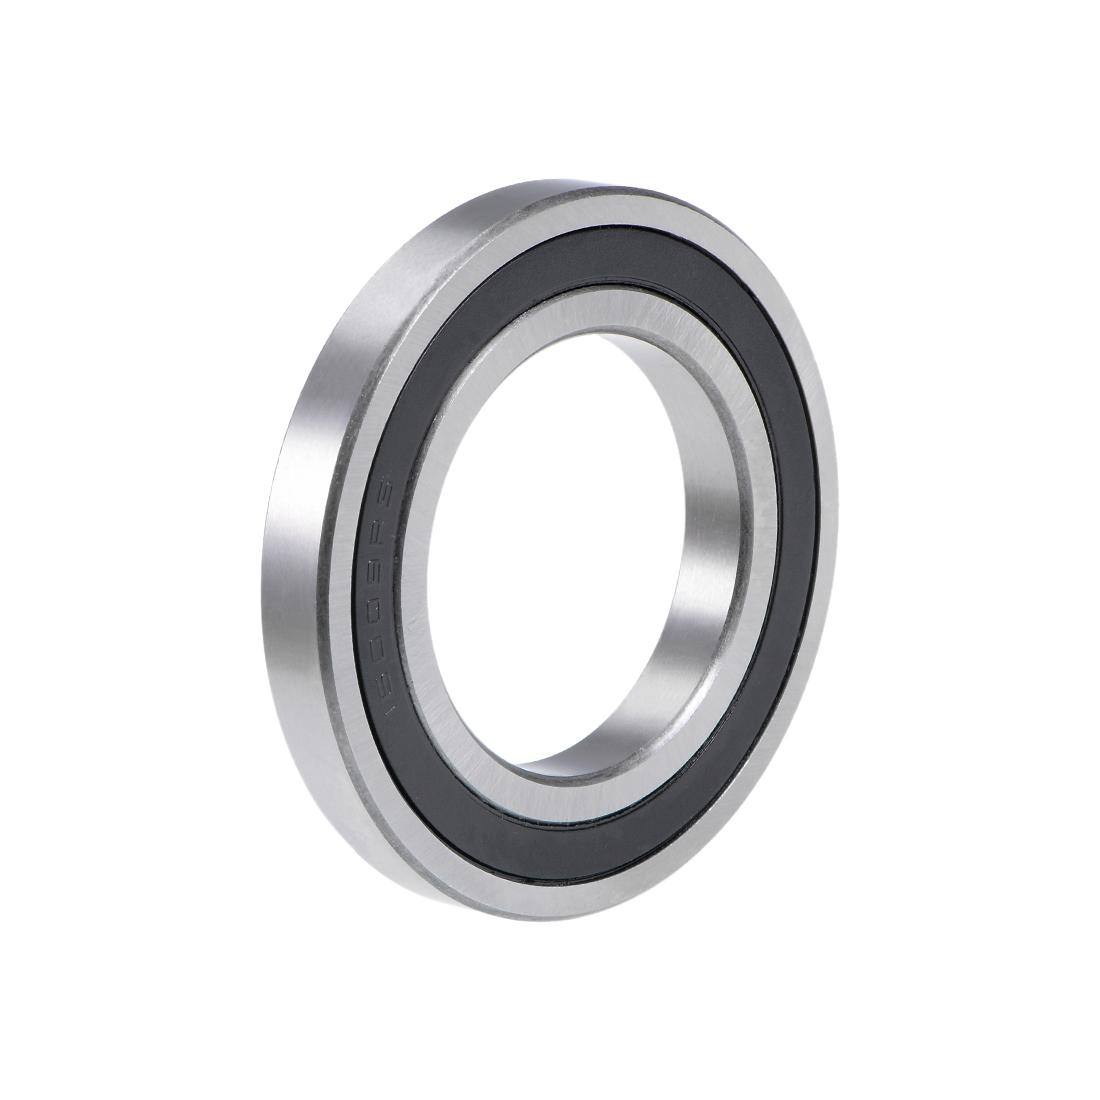 16009-2RS Deep Groove Ball Bearing 45x75x10mm Double Sealed Chrome Bearings